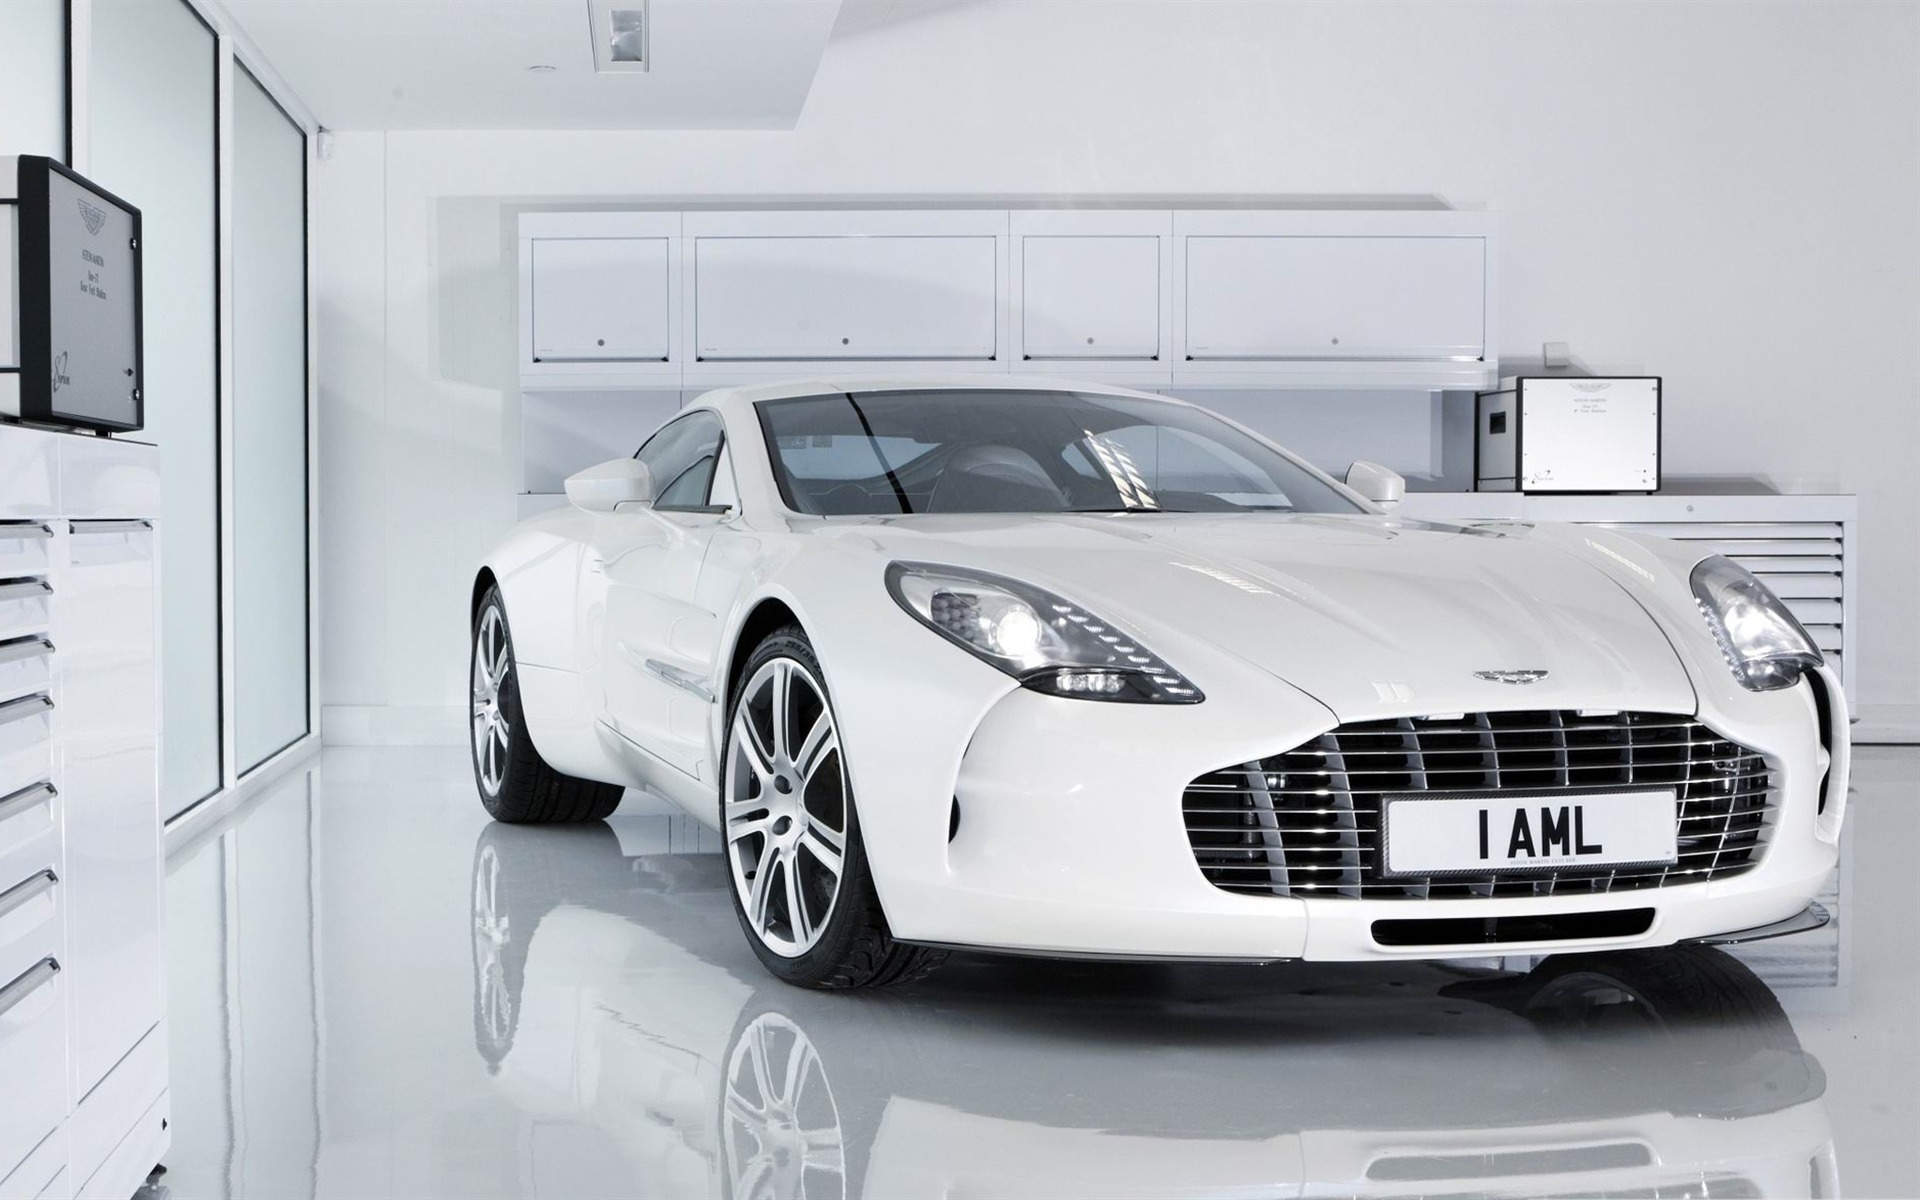 White Aston Martin One 2012 Luxury Car Hd Wallpaper